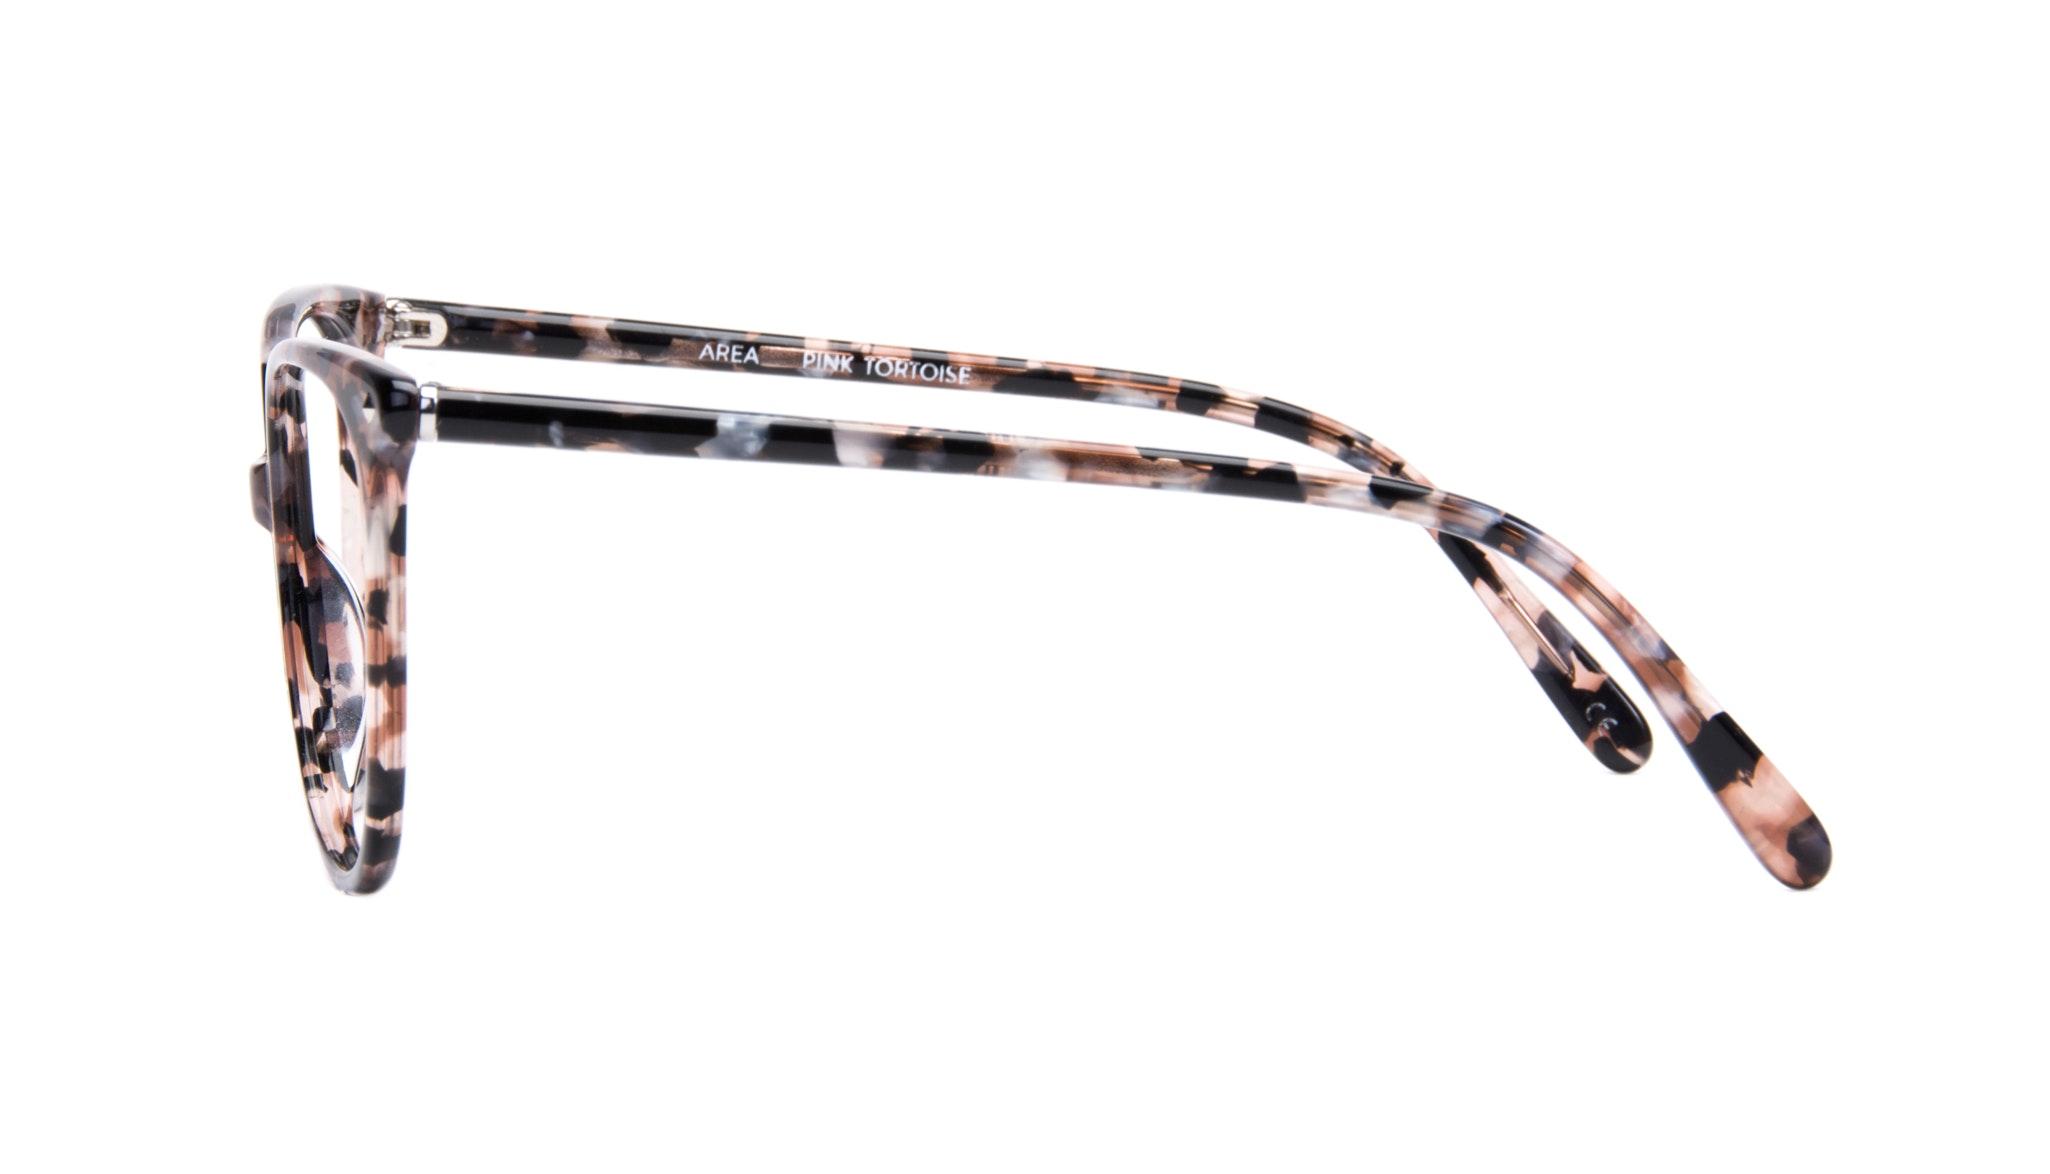 Affordable Fashion Glasses Cat Eye Square Eyeglasses Women Area Pink Tortoise Side